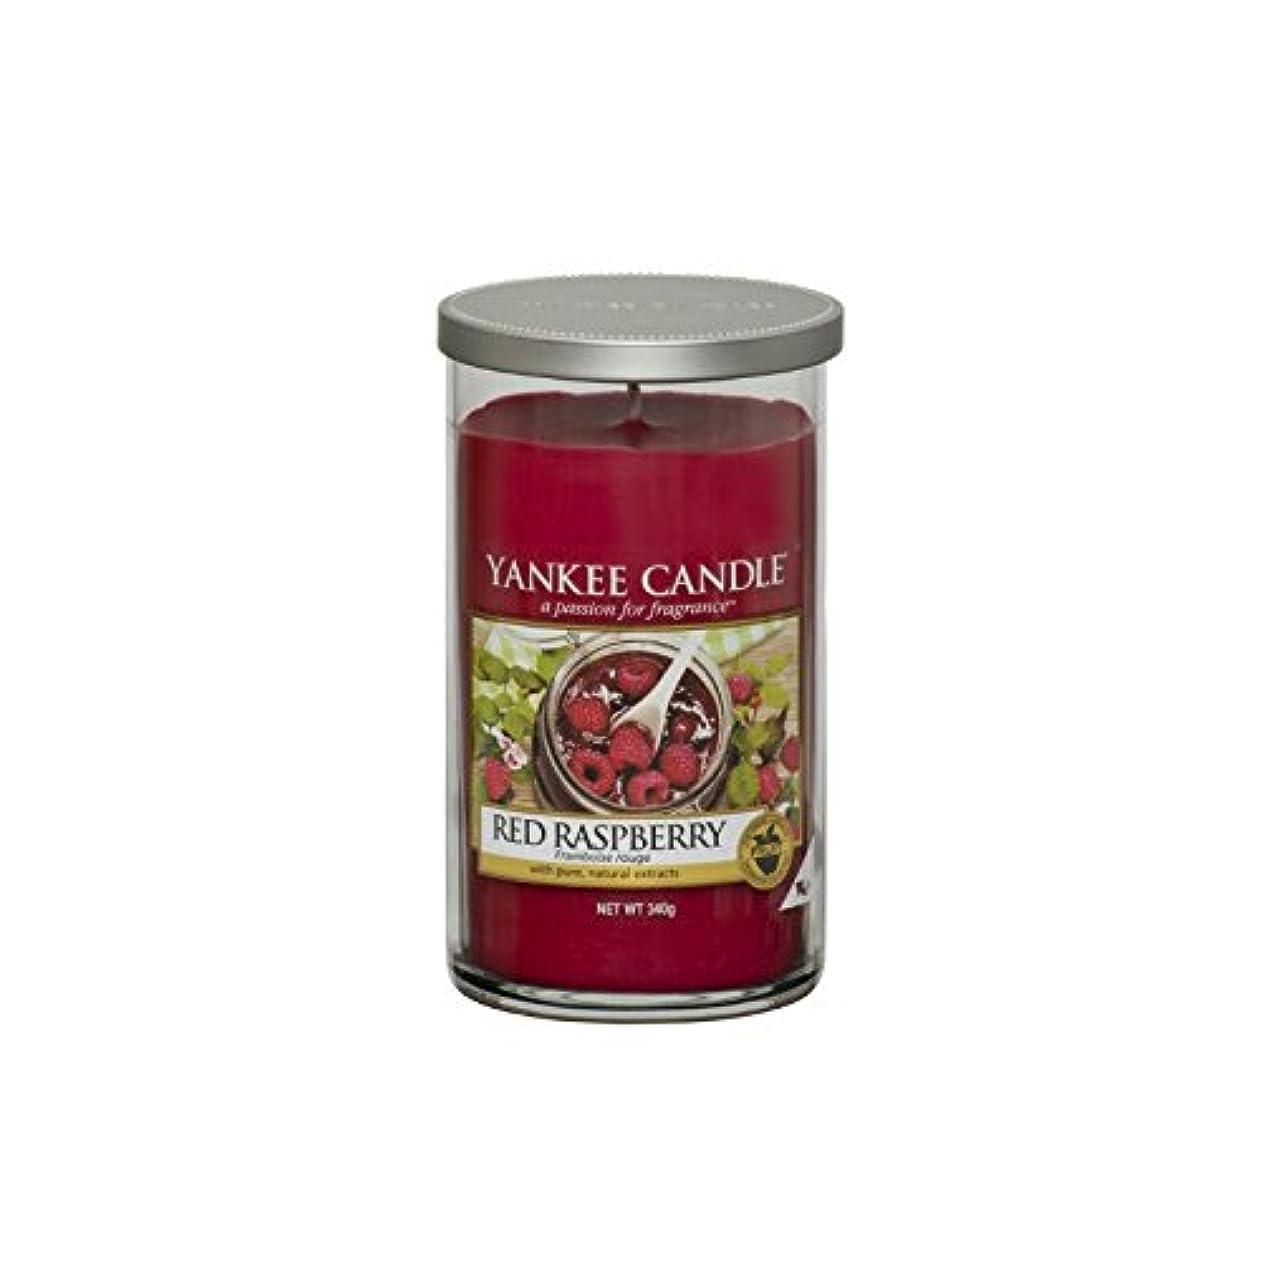 Yankee Candles Medium Pillar Candle - Red Raspberry (Pack of 6) - ヤンキーキャンドルメディアピラーキャンドル - レッドラズベリー (x6) [並行輸入品]